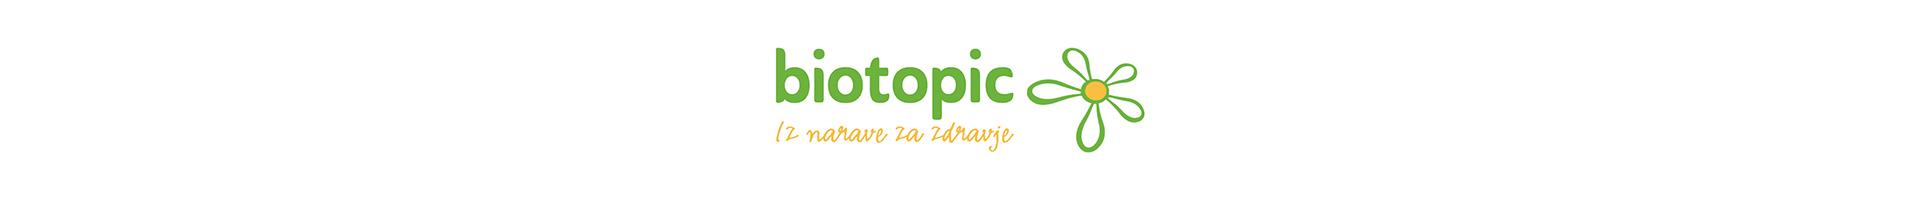 Biotopic Blog